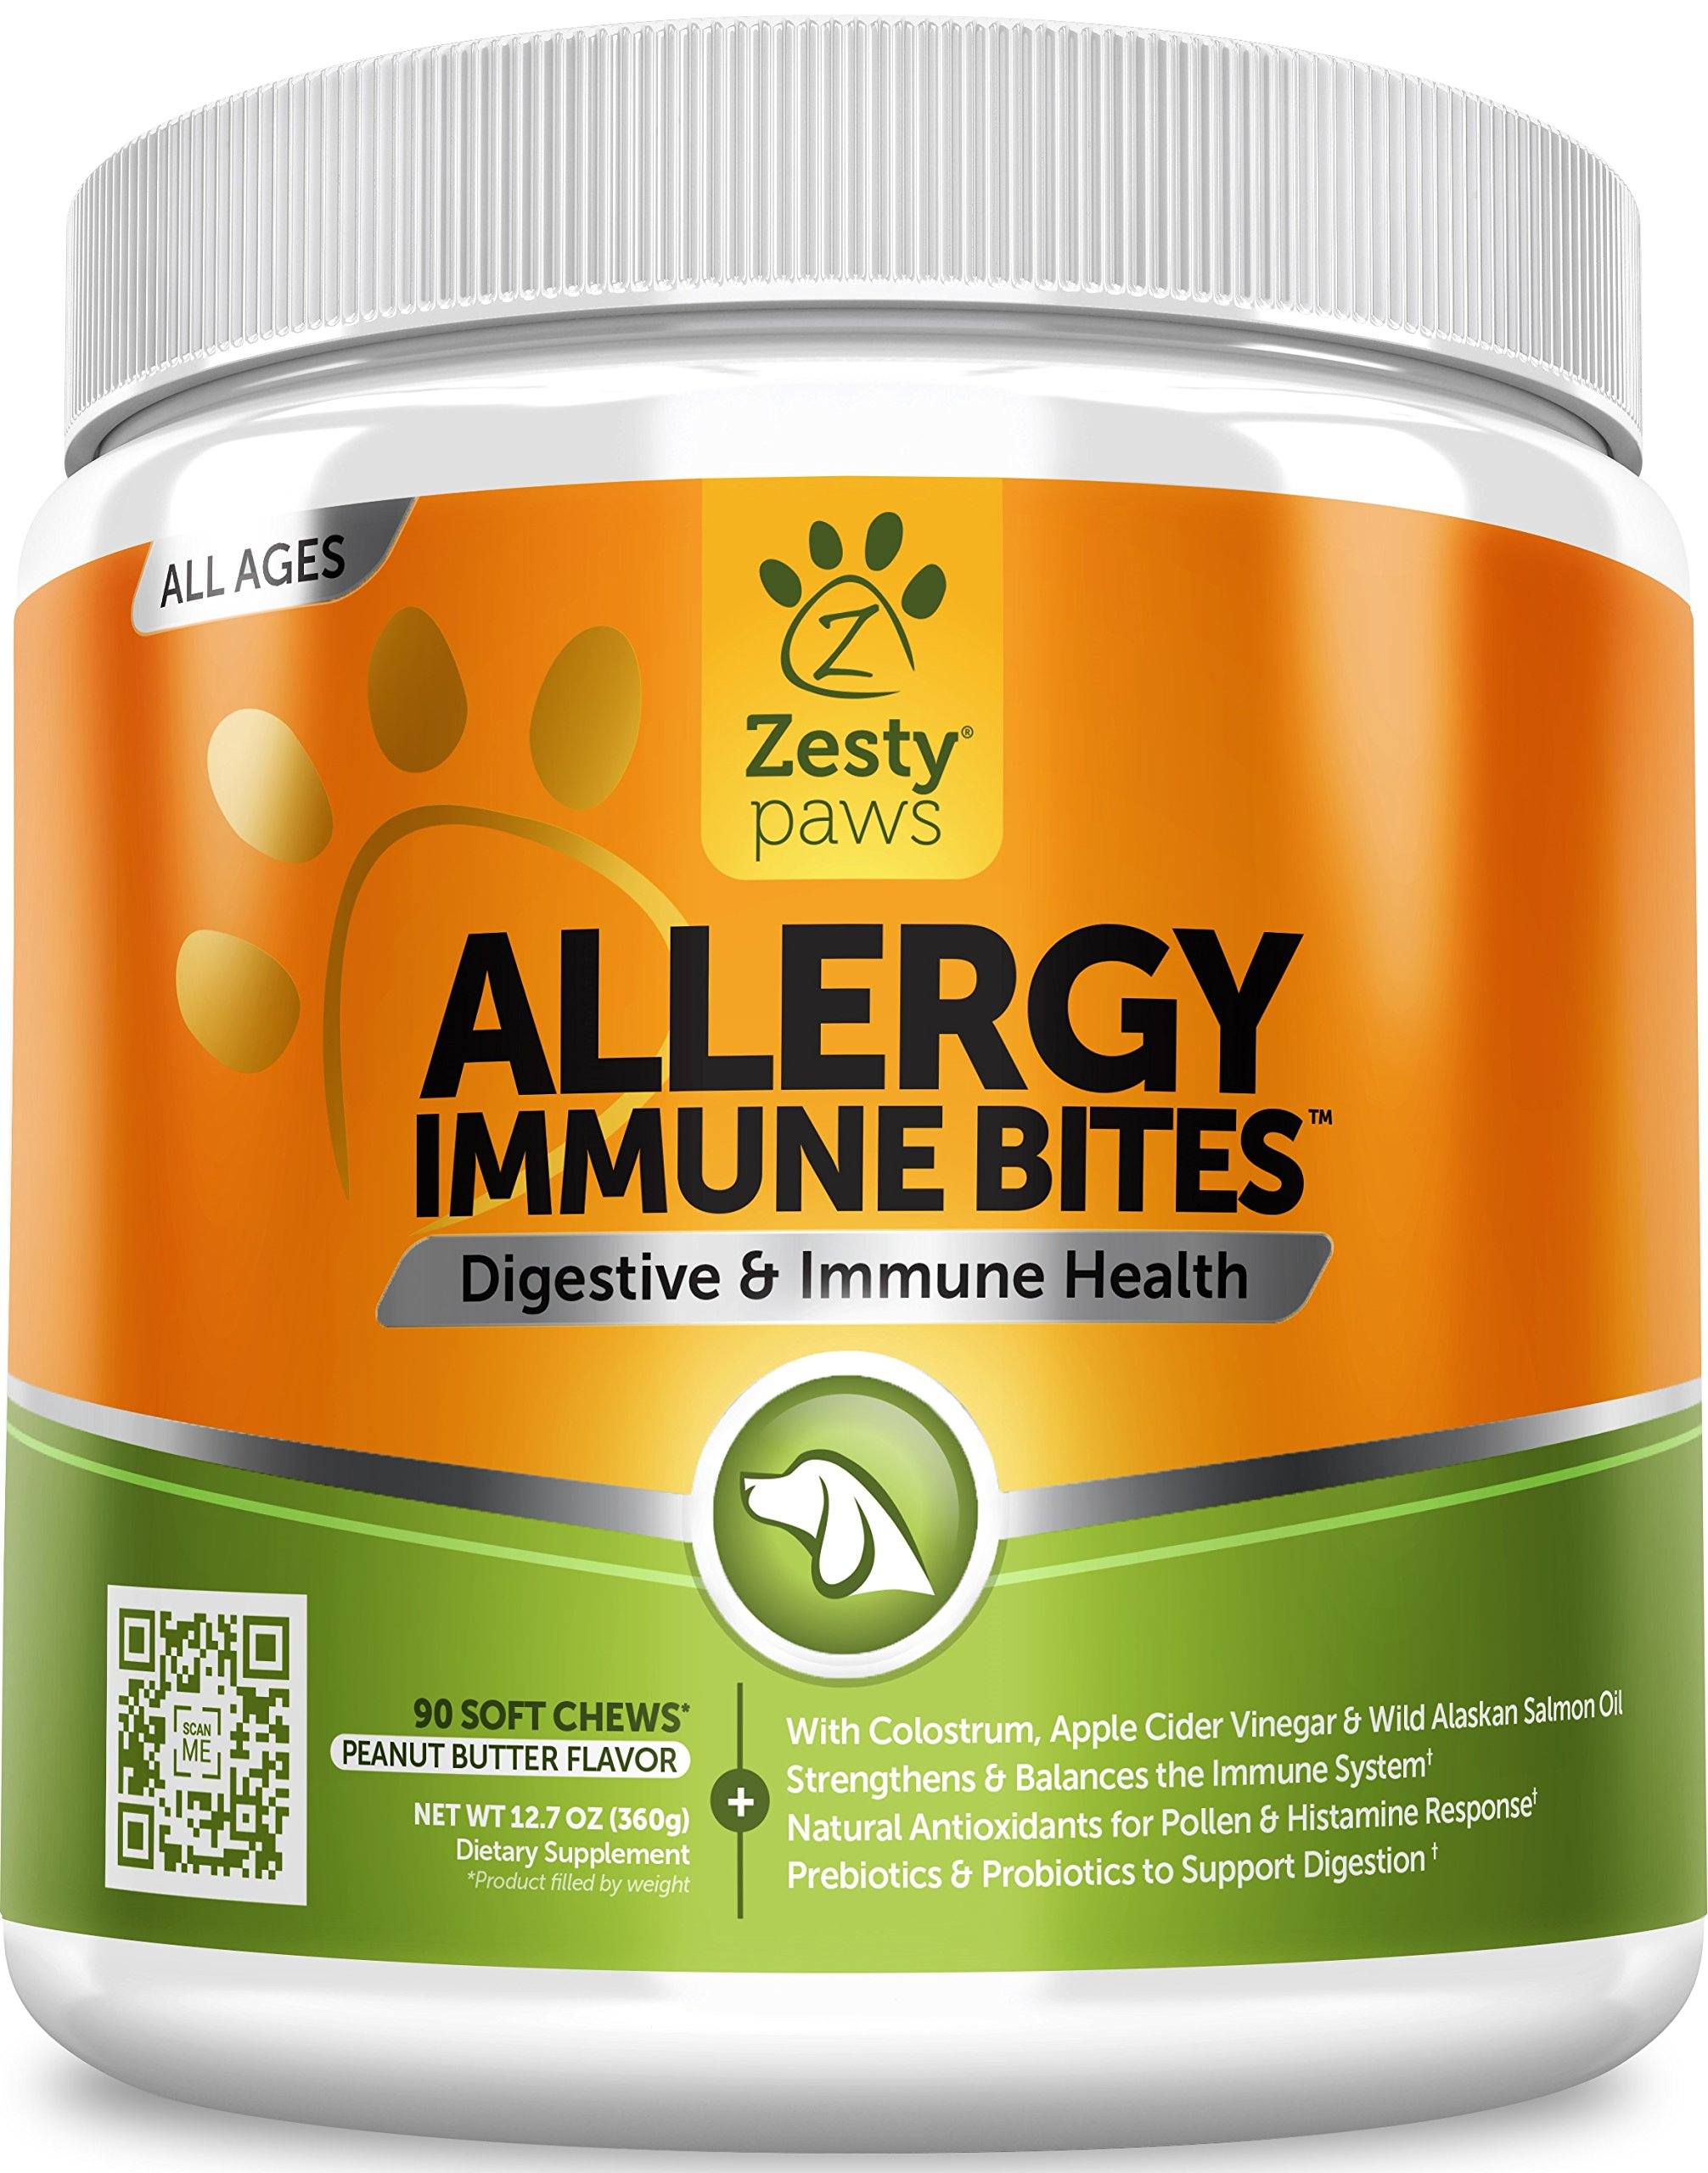 Allergy Immune Supplement for Dogs - With Omega 3 Wild Alaskan Salmon Fish Oil & EpiCor + Prebiotics & Probiotics - Anti Itch & Skin Hot Spots + Seasonal Allergies - Peanut Butter Flavor - 90 Chews